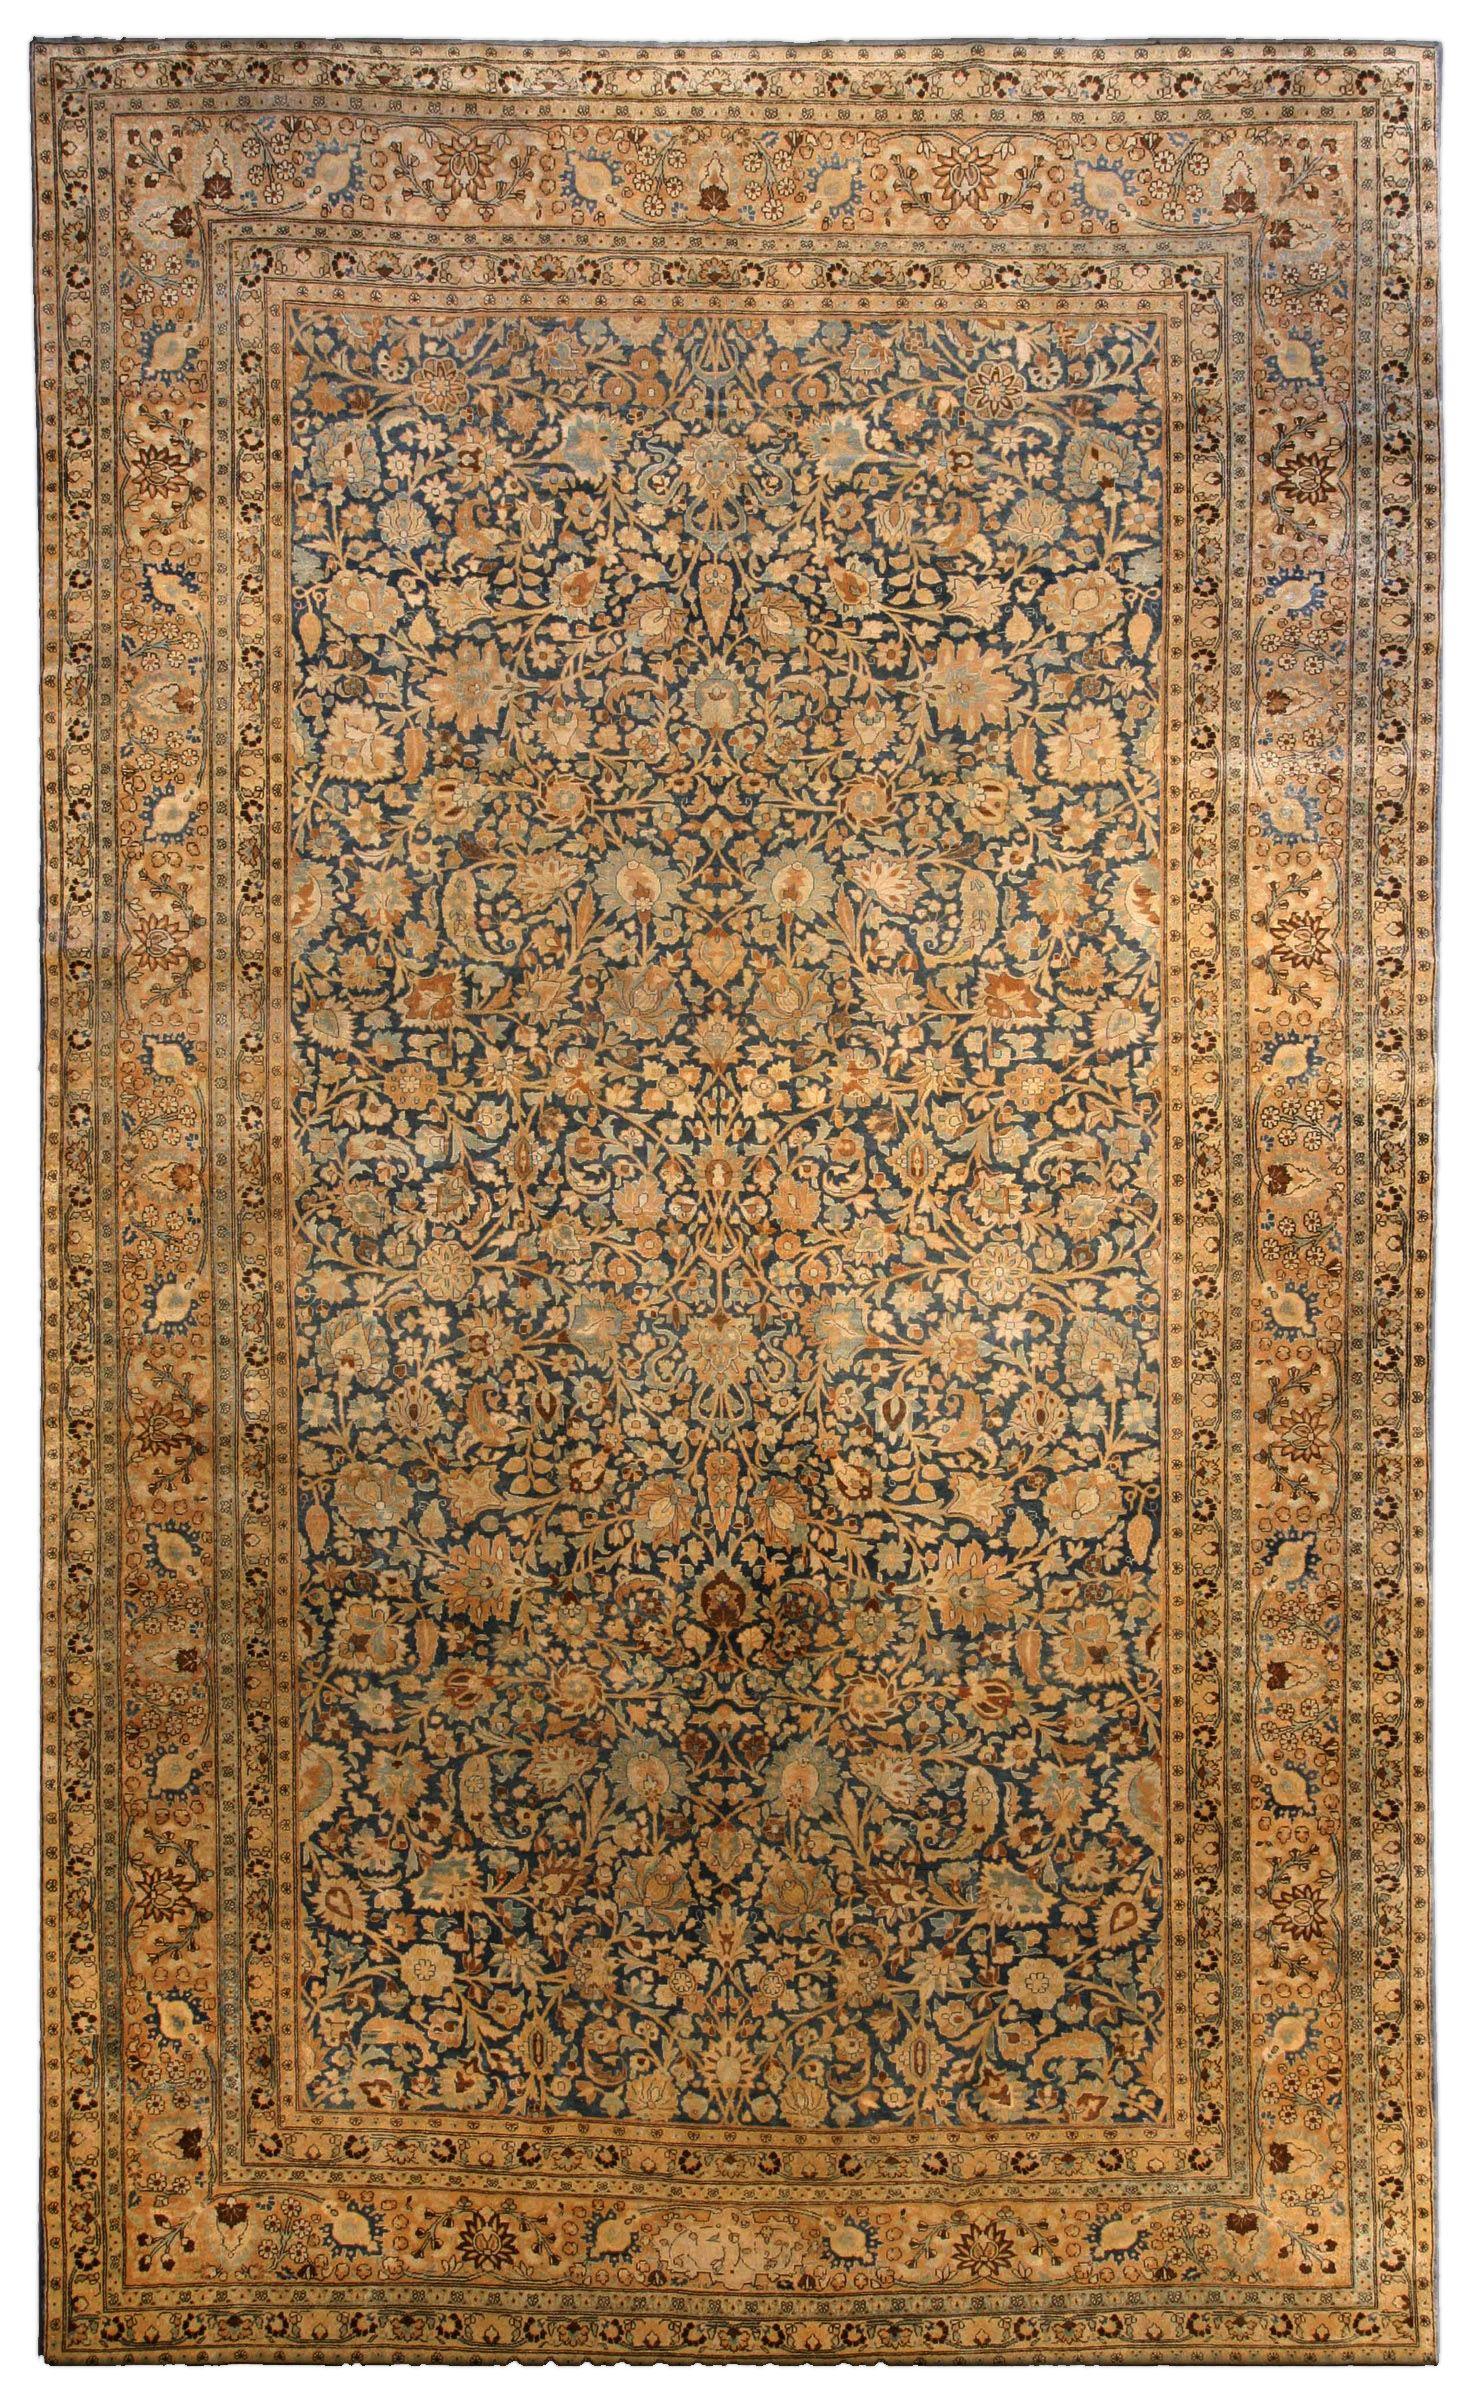 Antique Persian Tabriz Carpet Rugs On Carpet Cool Rugs